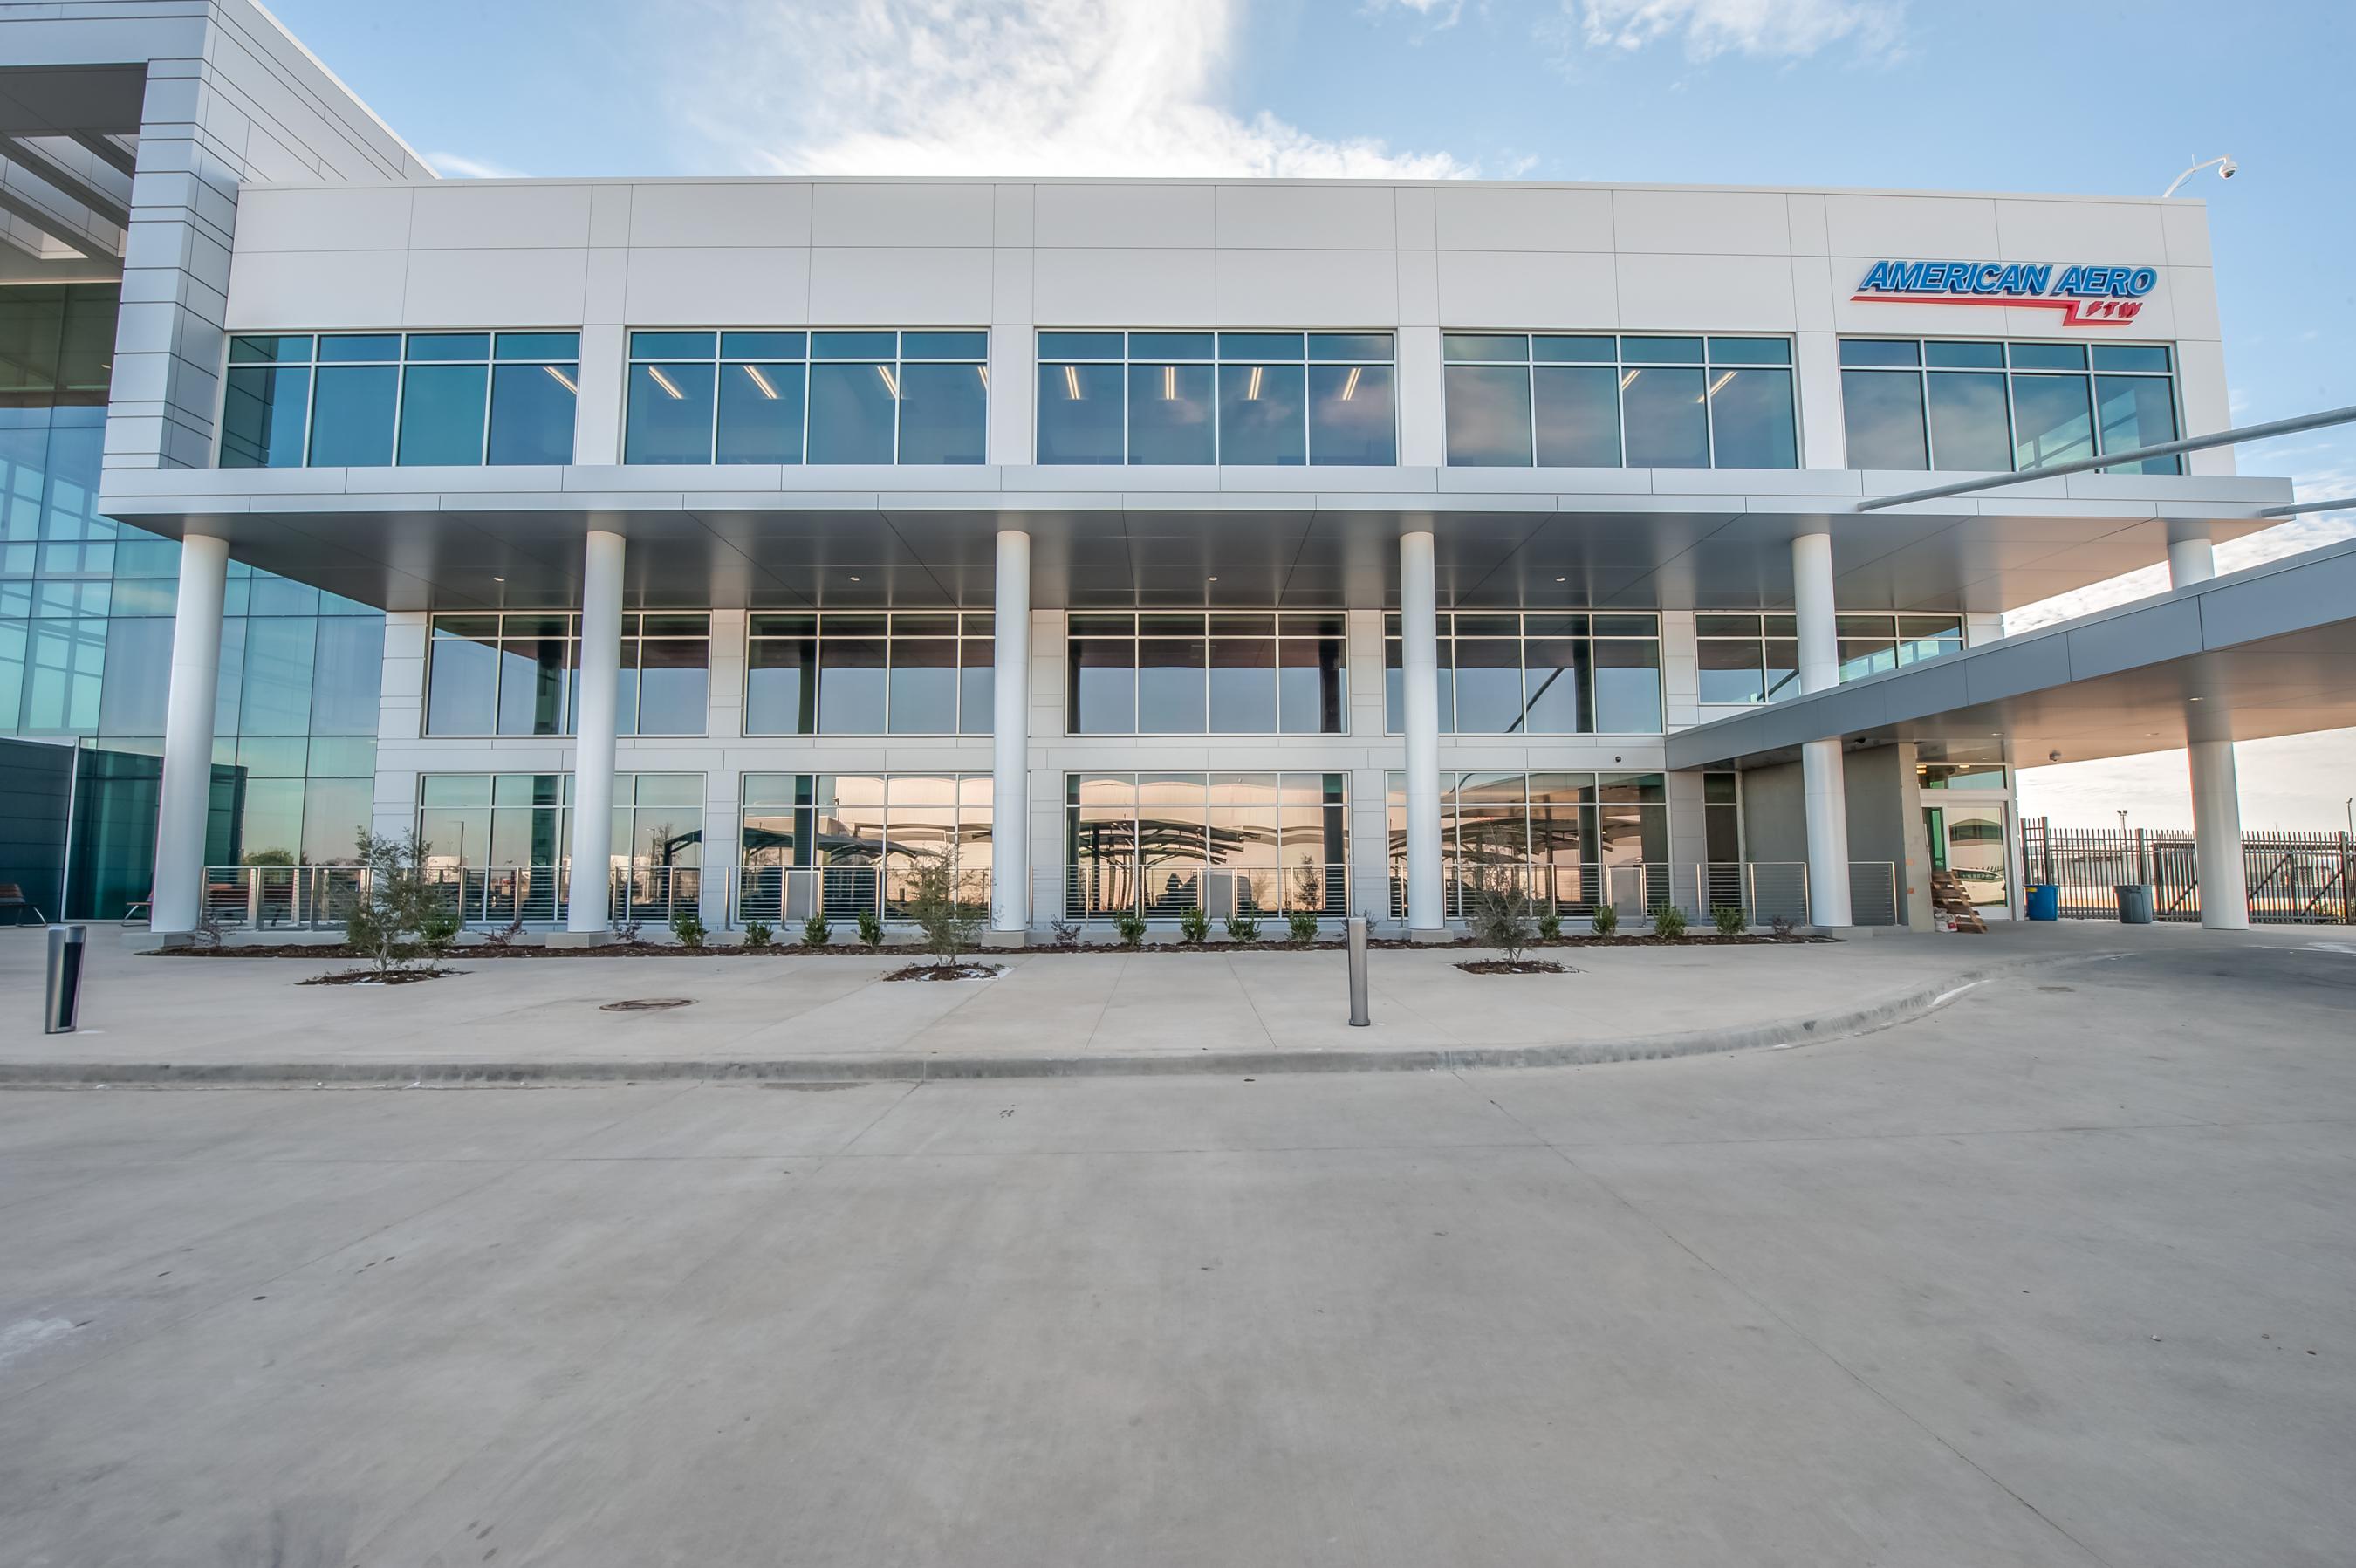 Meacham International Airport